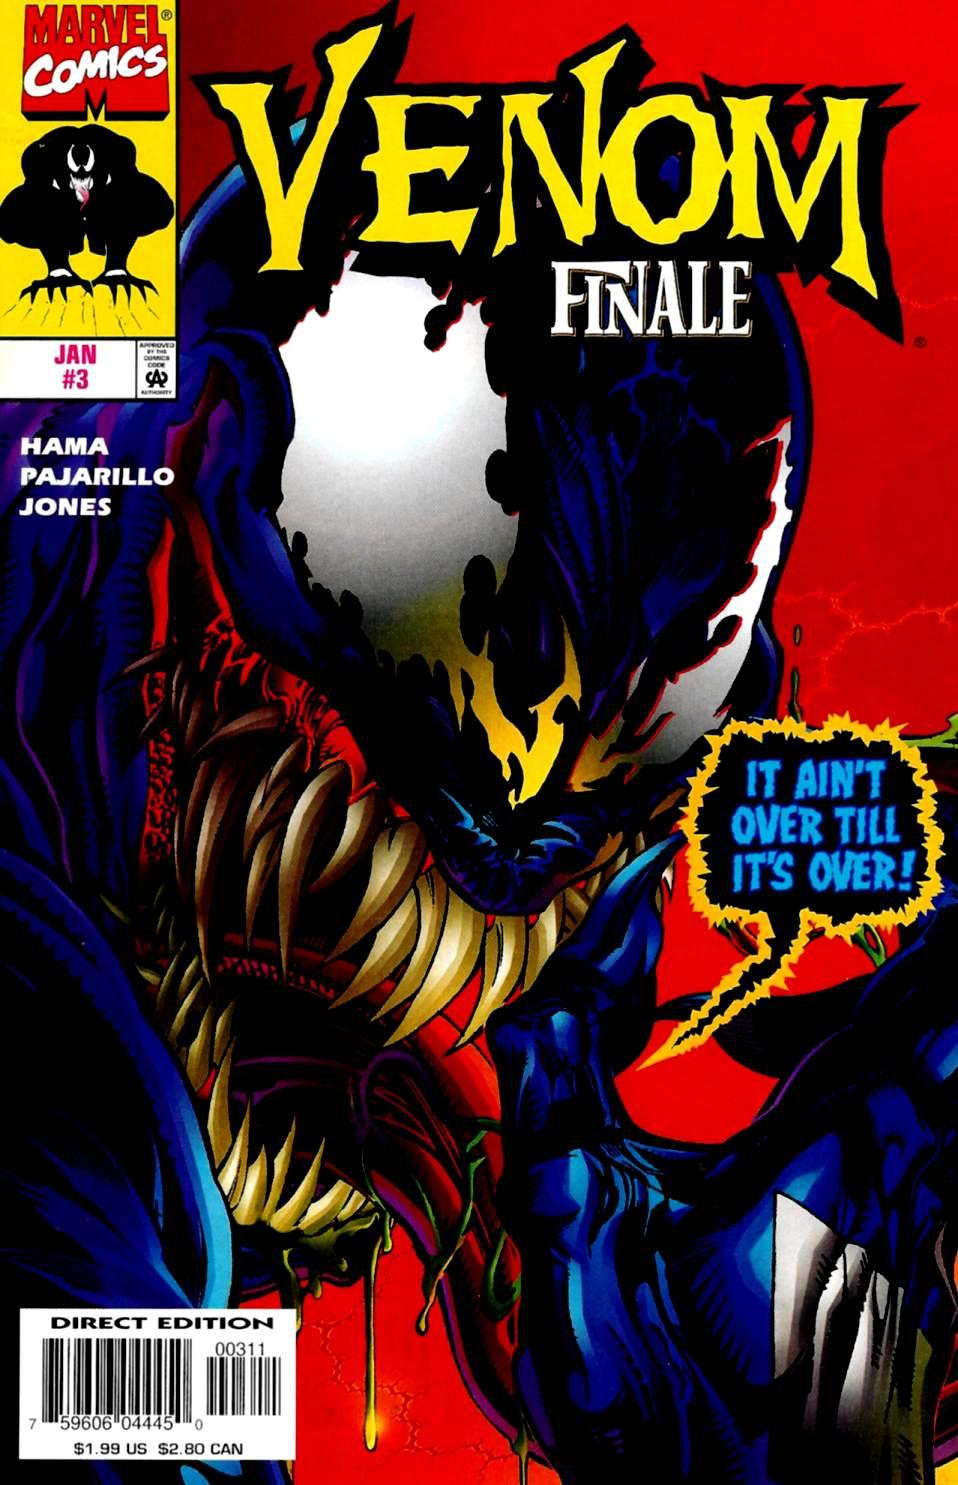 Venom: The Finale #3 - Read Venom: The Finale Issue #3 Online